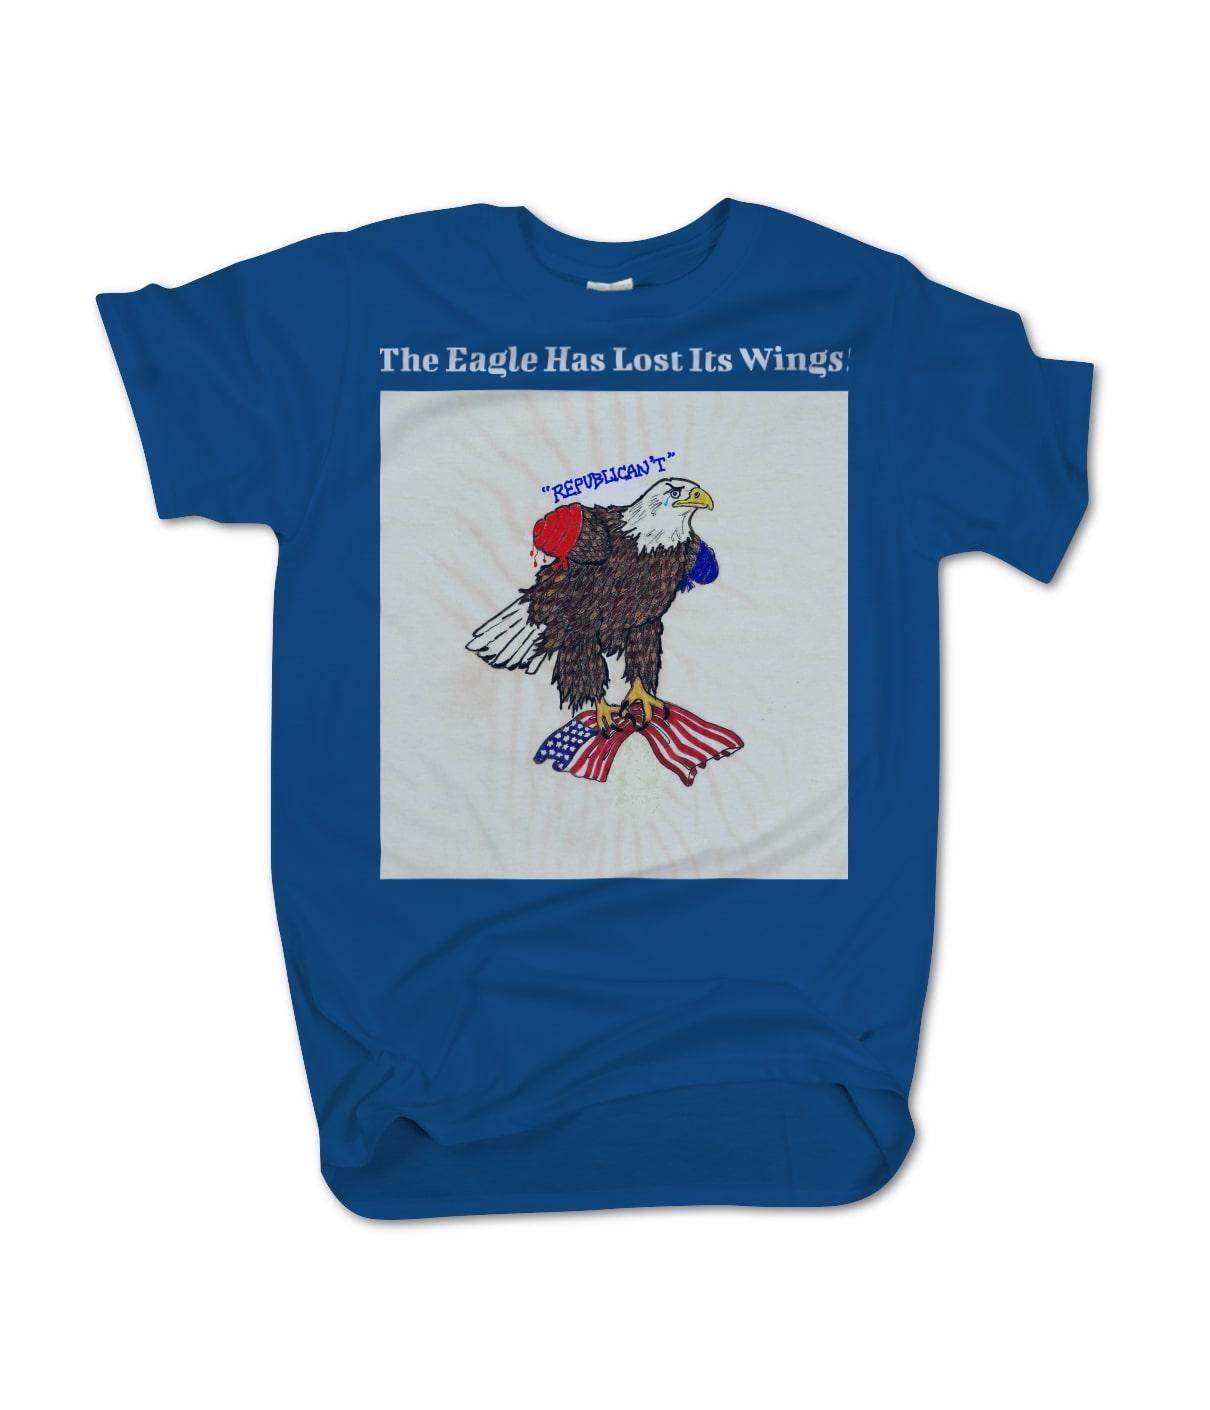 Matthew f  blowers iii the eagle has lost its wings   1505357501